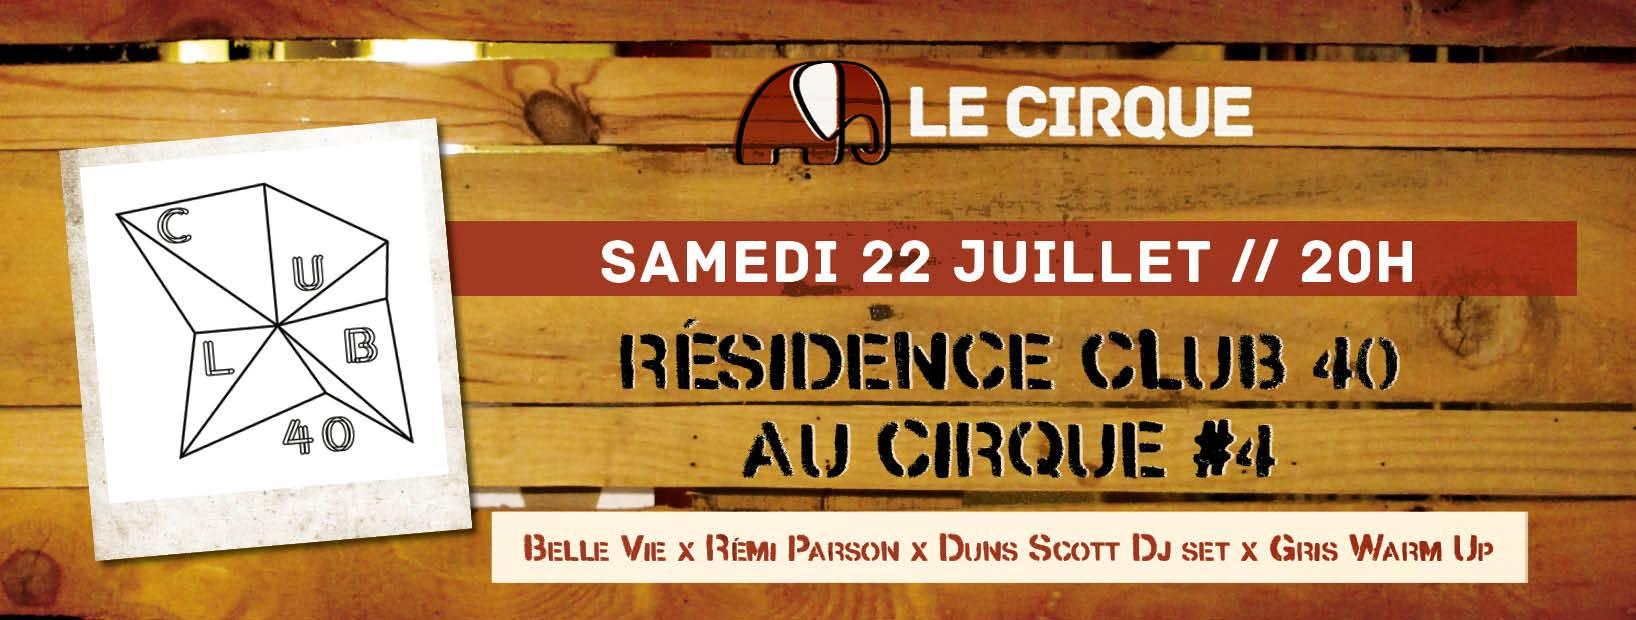 CLUB 40 x Cirque #4